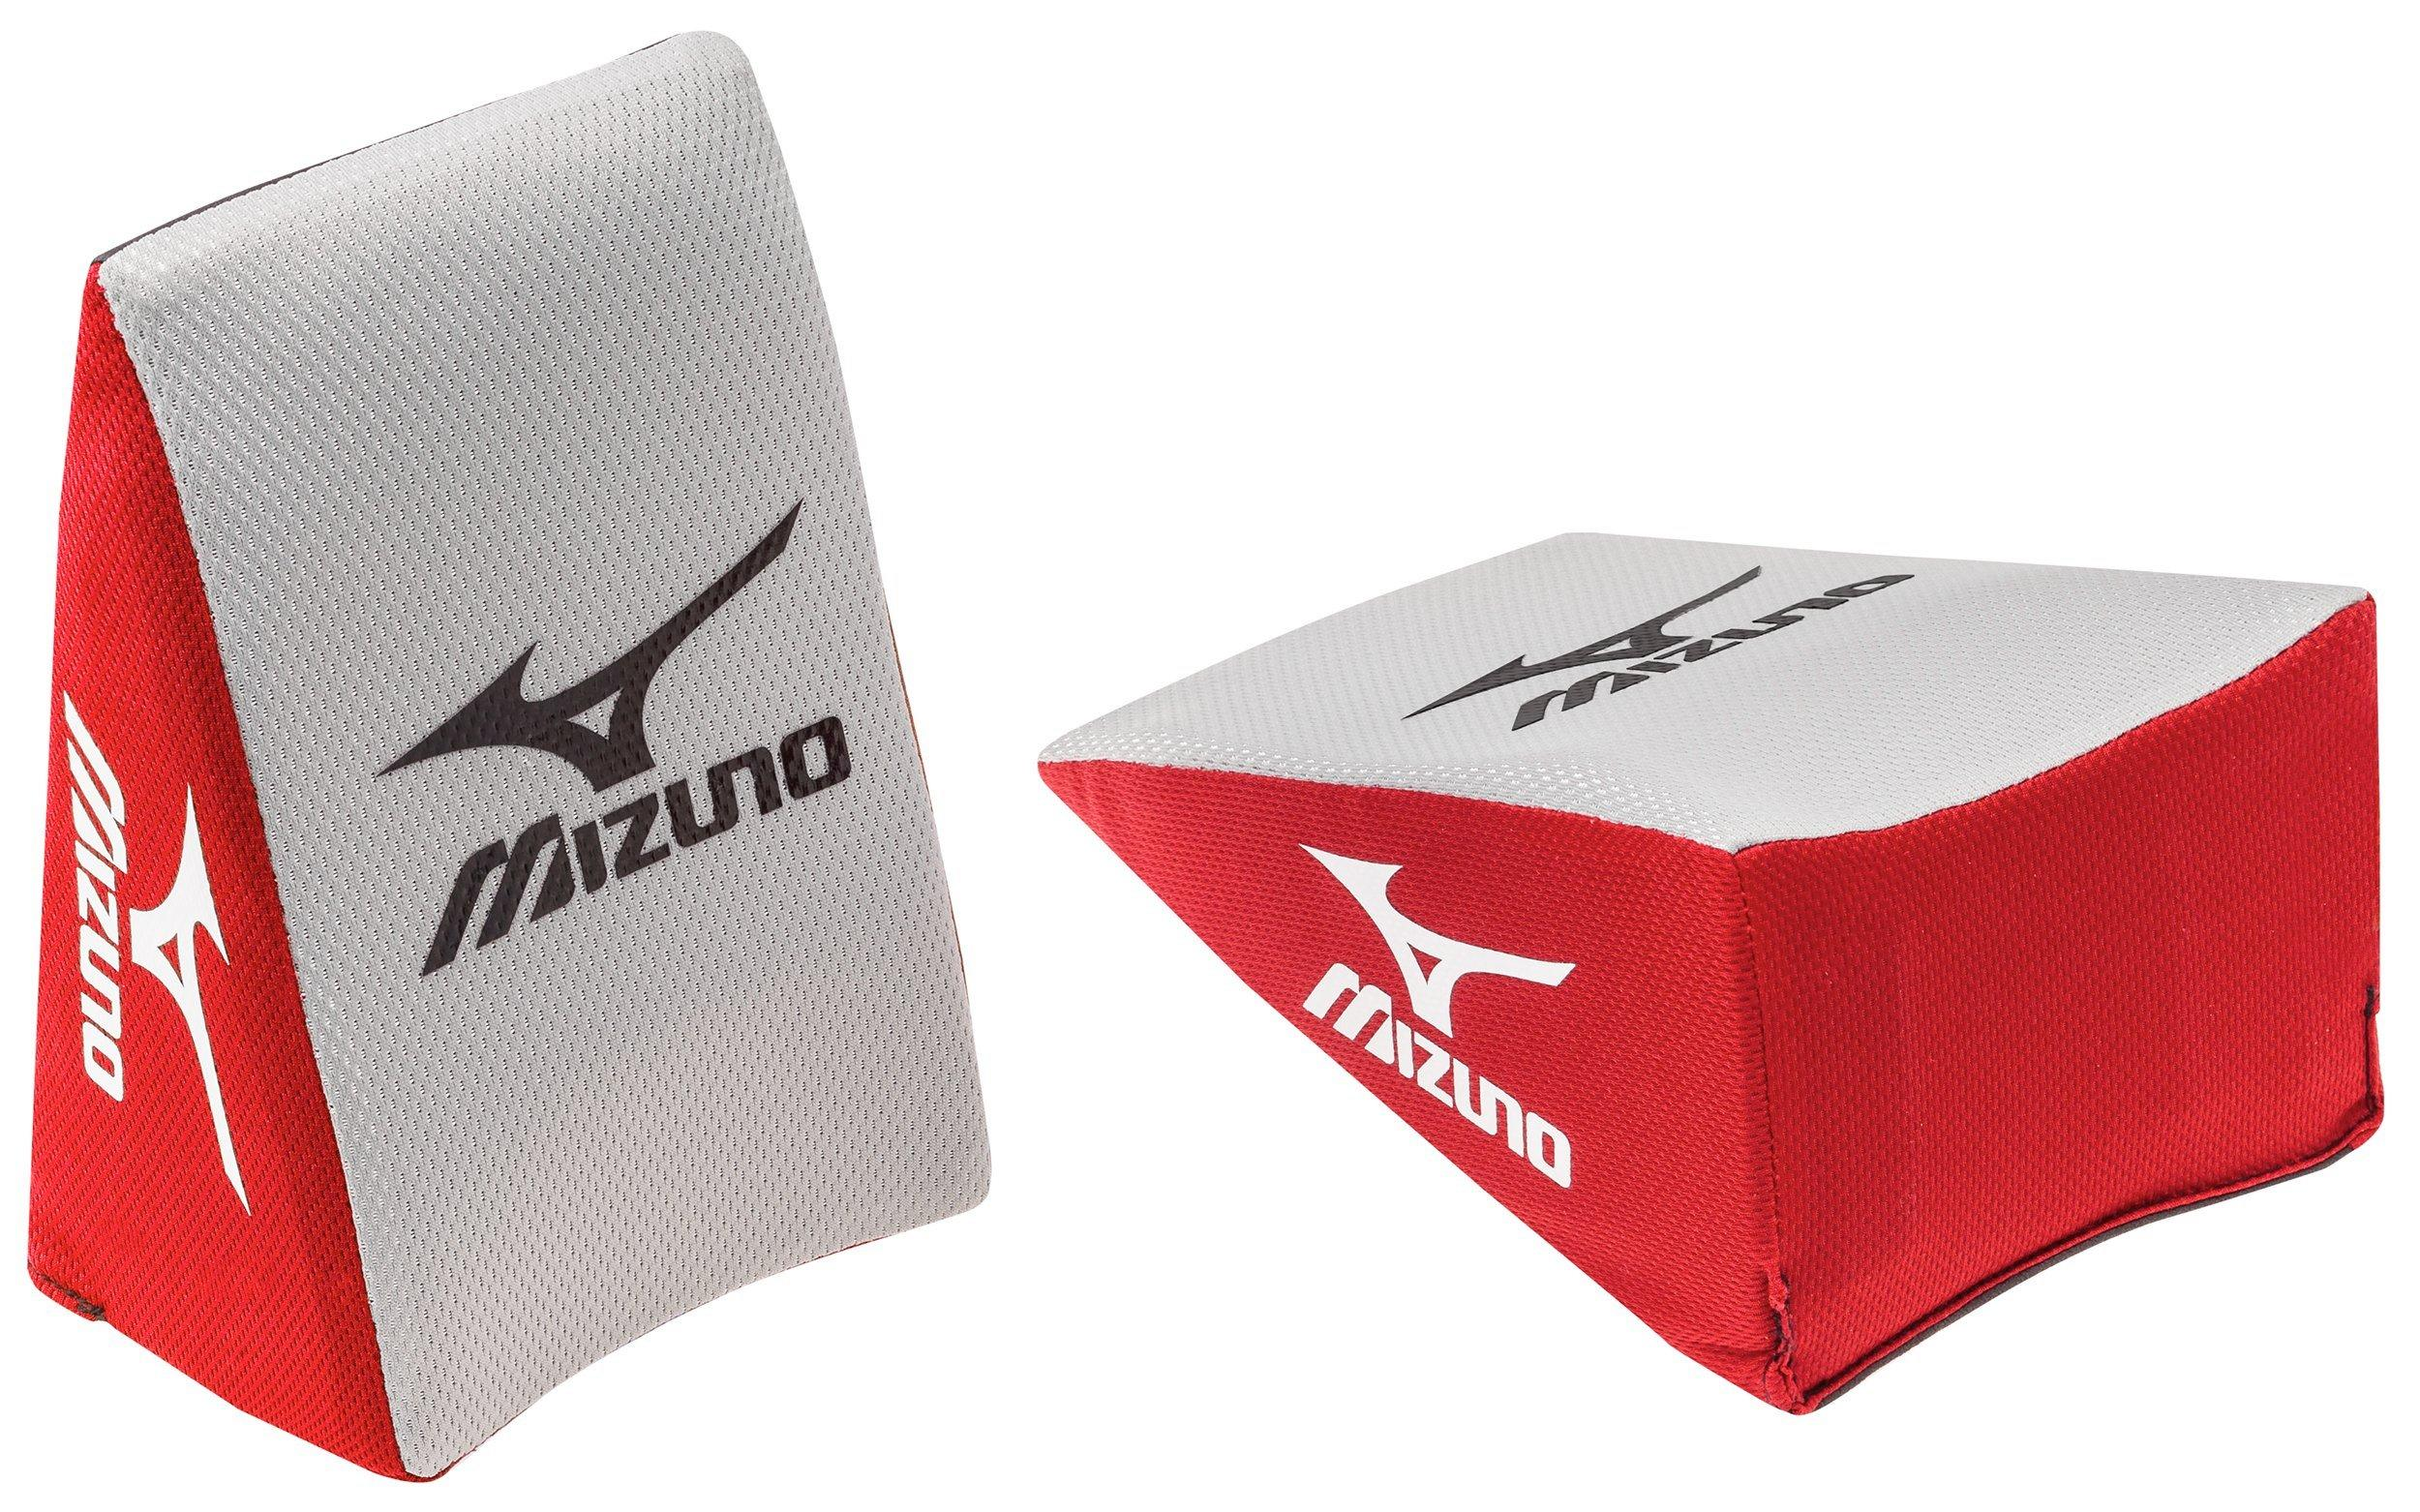 Mizuno Catcher s Knee Wedge Small  - $25.00